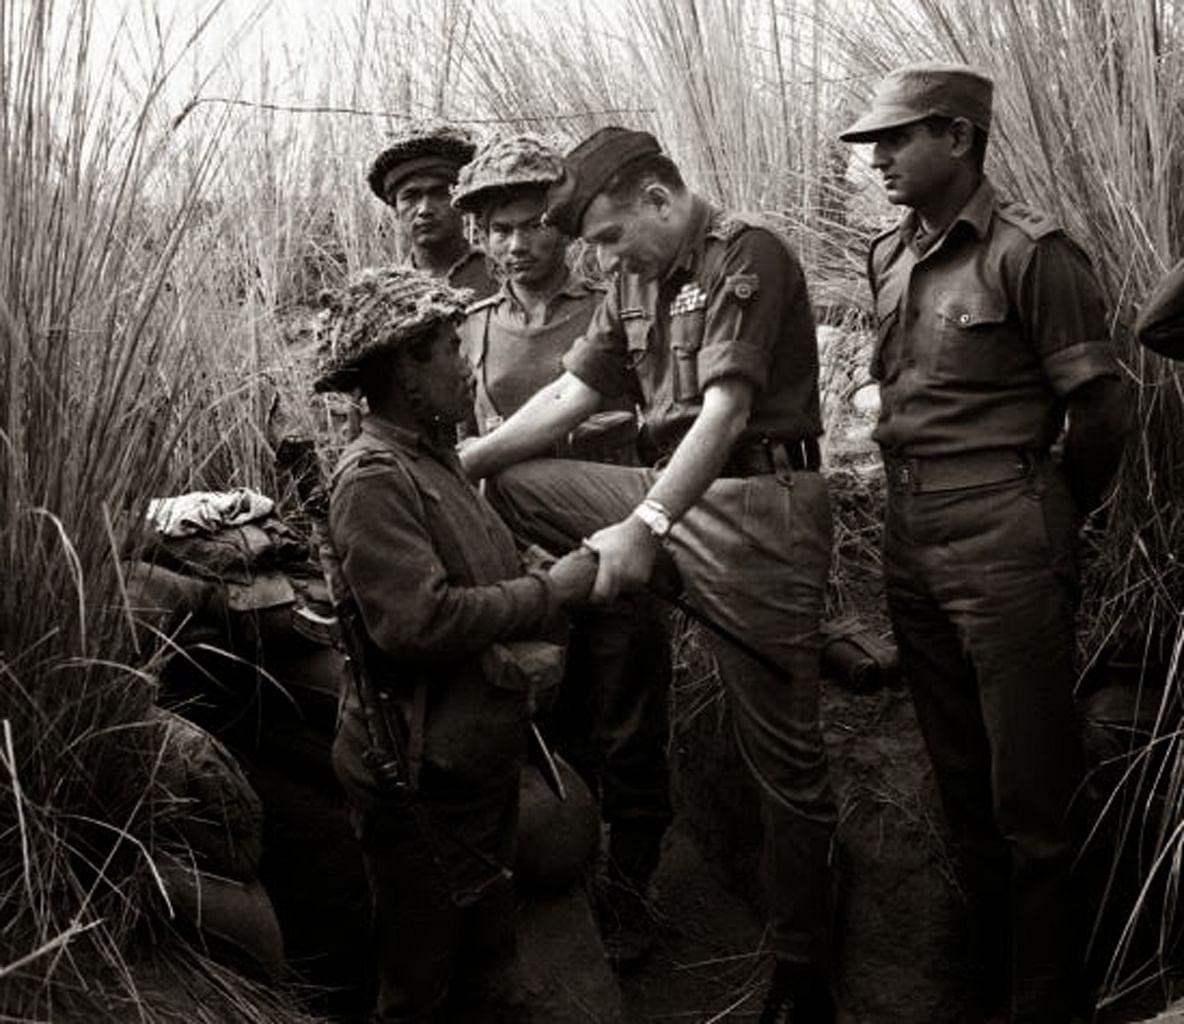 "Sam Bahadur. (Photo Courtesy: <a href=""http://inbministry.blogspot.in/2014/04/sam-bahadur-indefatigable-field-marshal.html"">Major General BNBM Prasad &amp; DPR Photo Division</a>)"